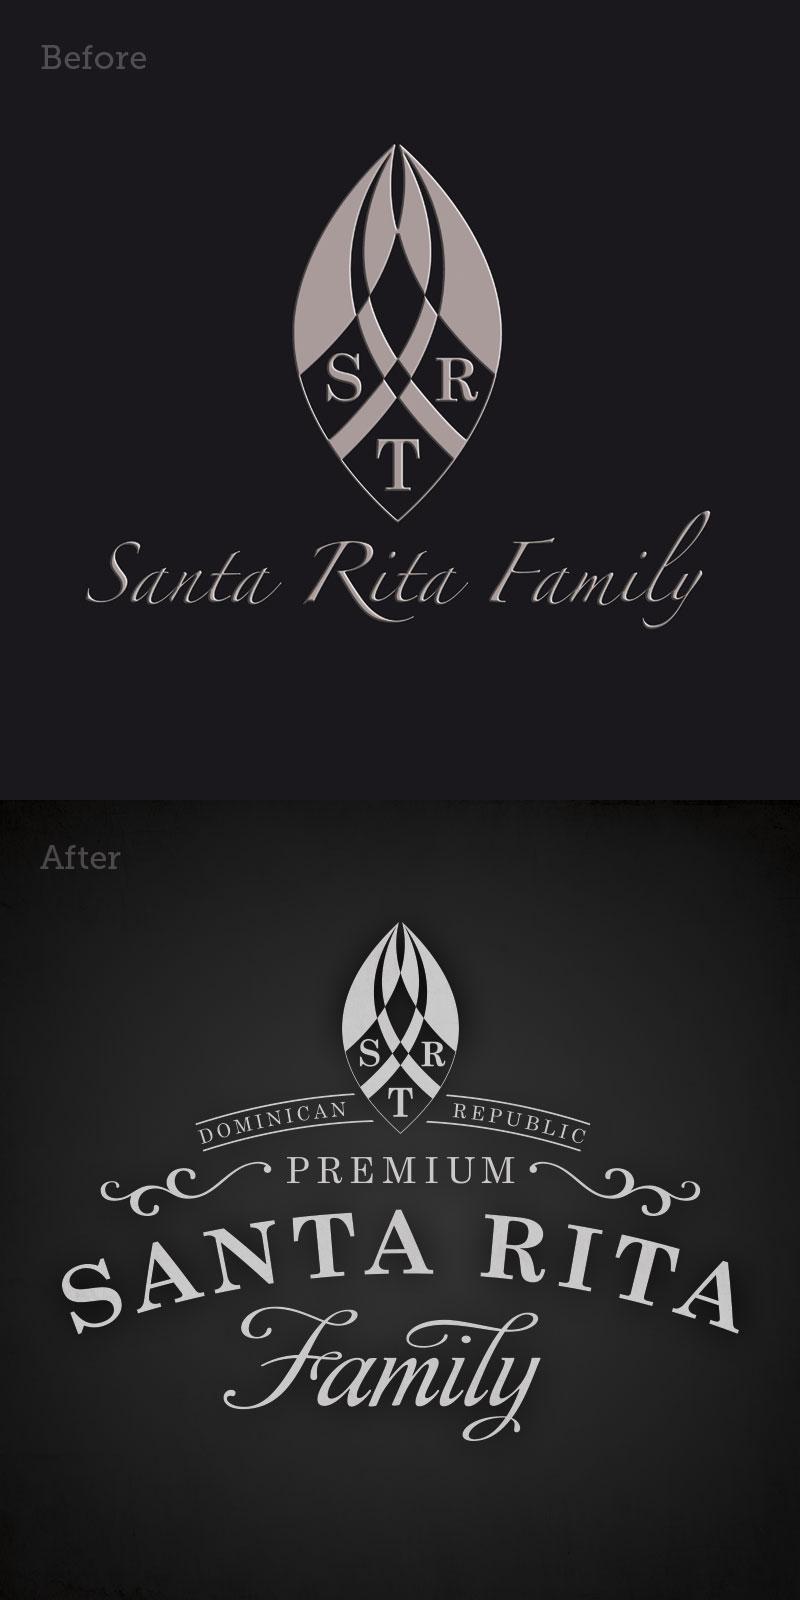 SRT Cigars Logo Redesign | Elden Creative Group